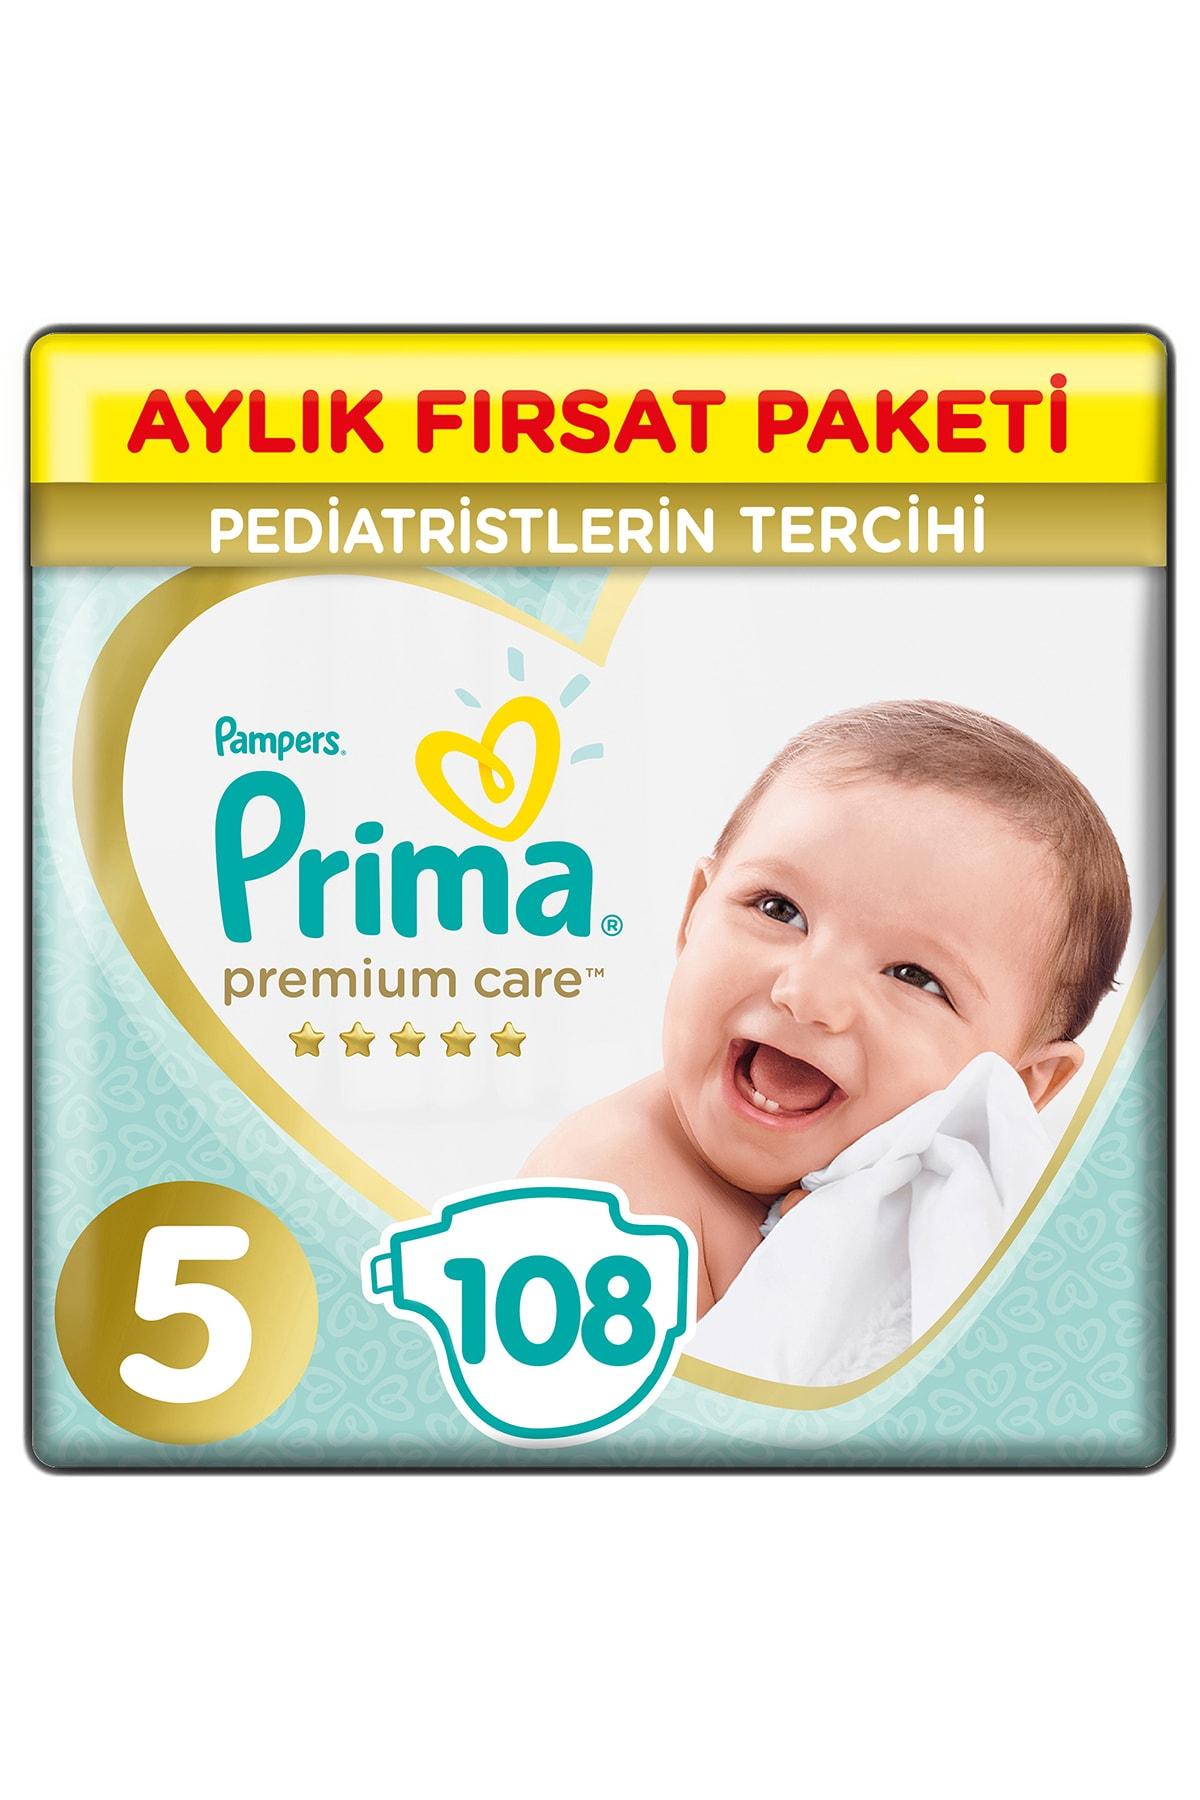 Bebek Bezi Premium Care 5 Beden 108 Adet Junior Aylık Fırsat Paketi